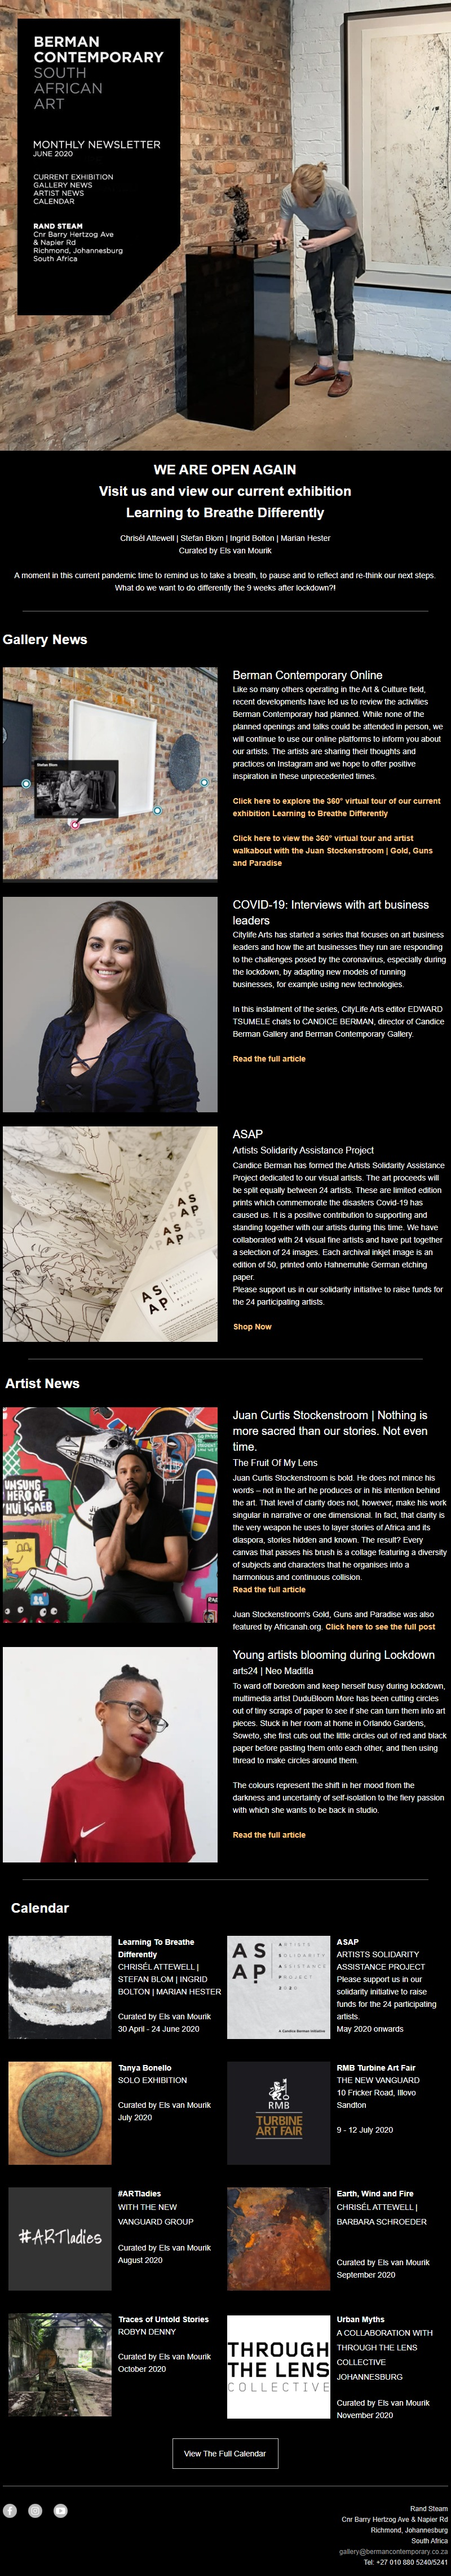 Berman Contemporary newsletter